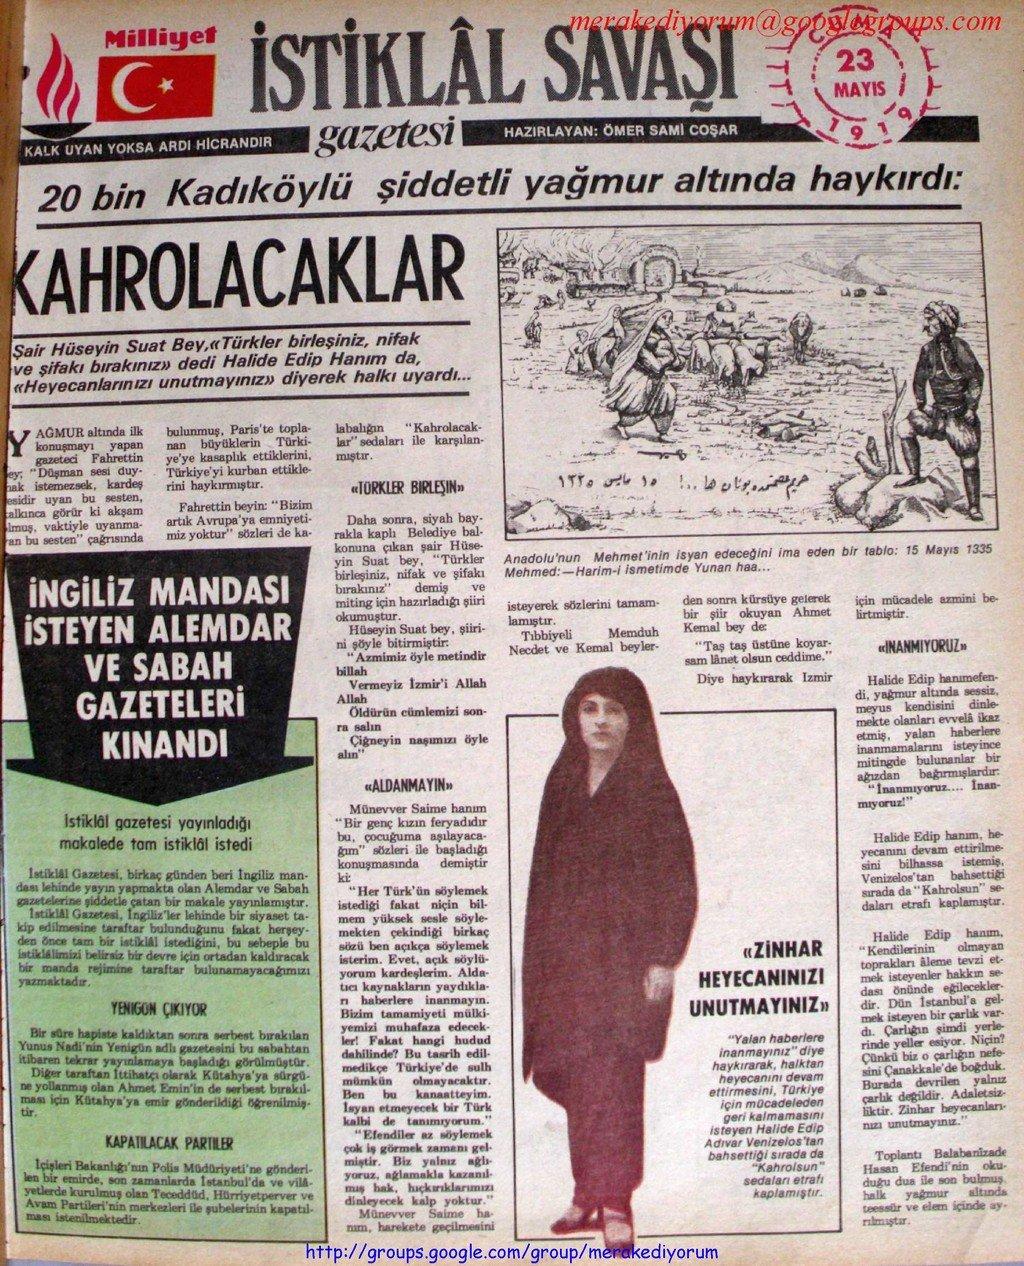 istiklal savaşı gazetesi - 23 mayıs 1919